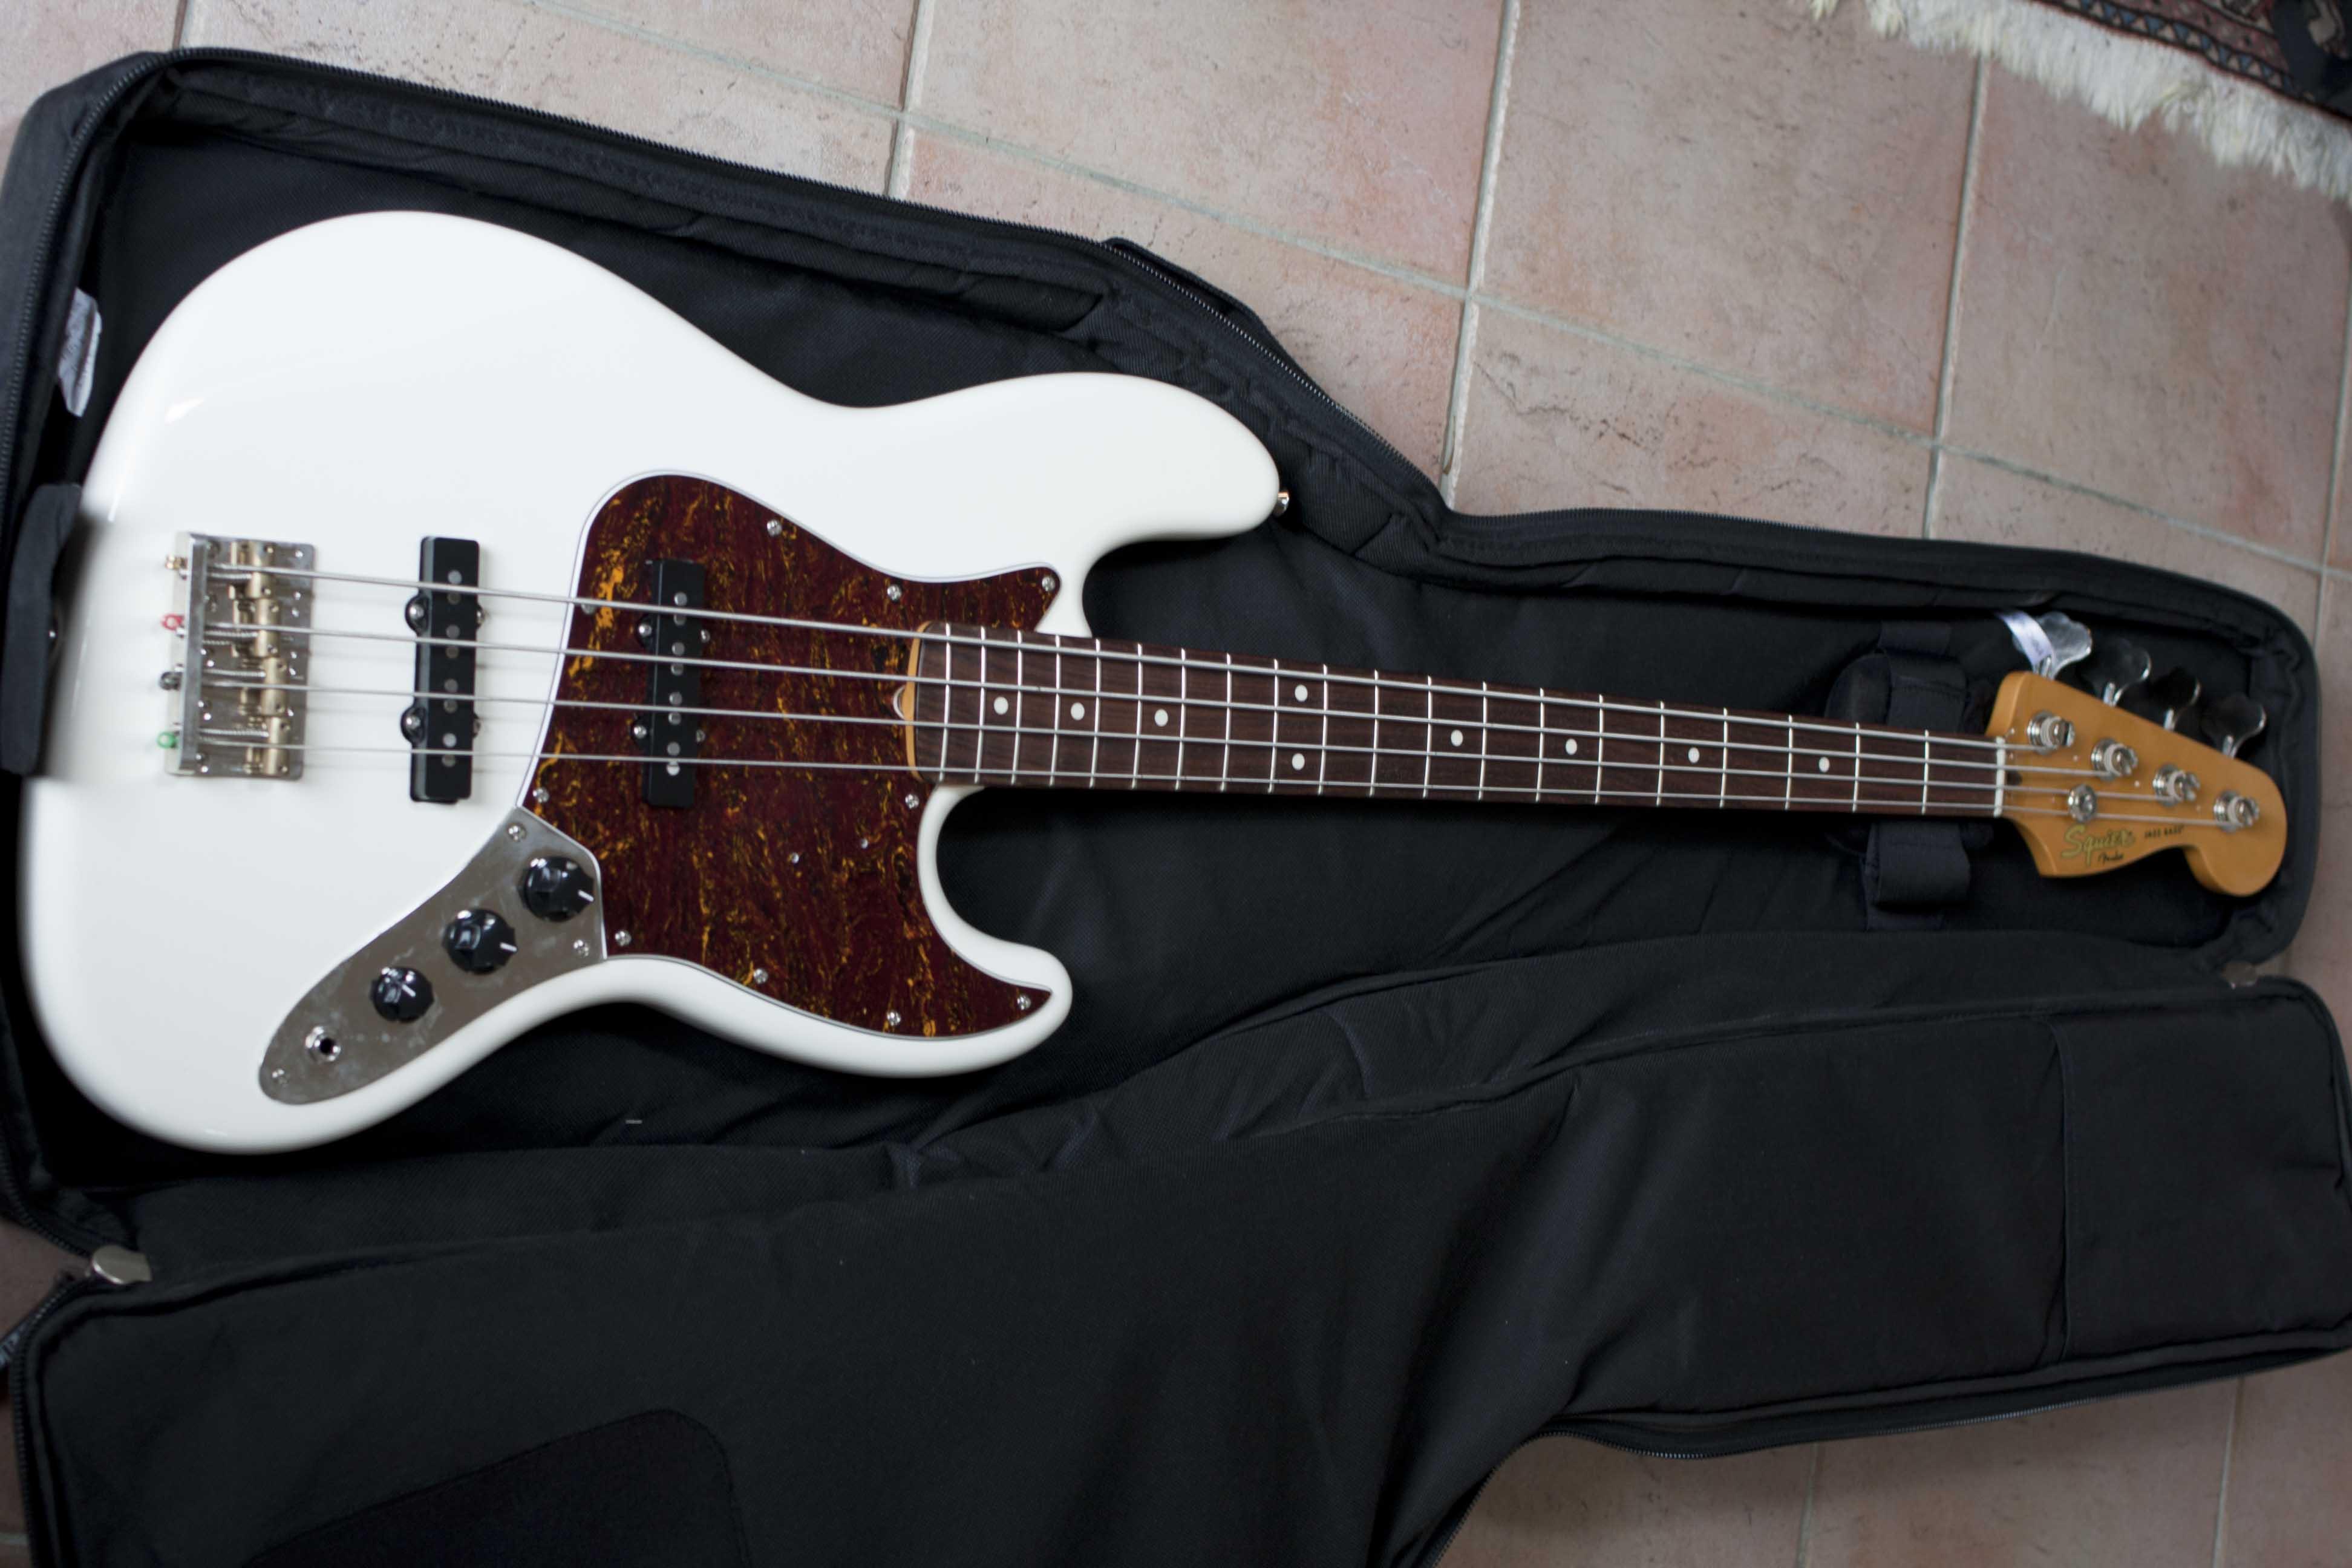 squier classic vibe jazz bass  u0026 39 60s image   713871